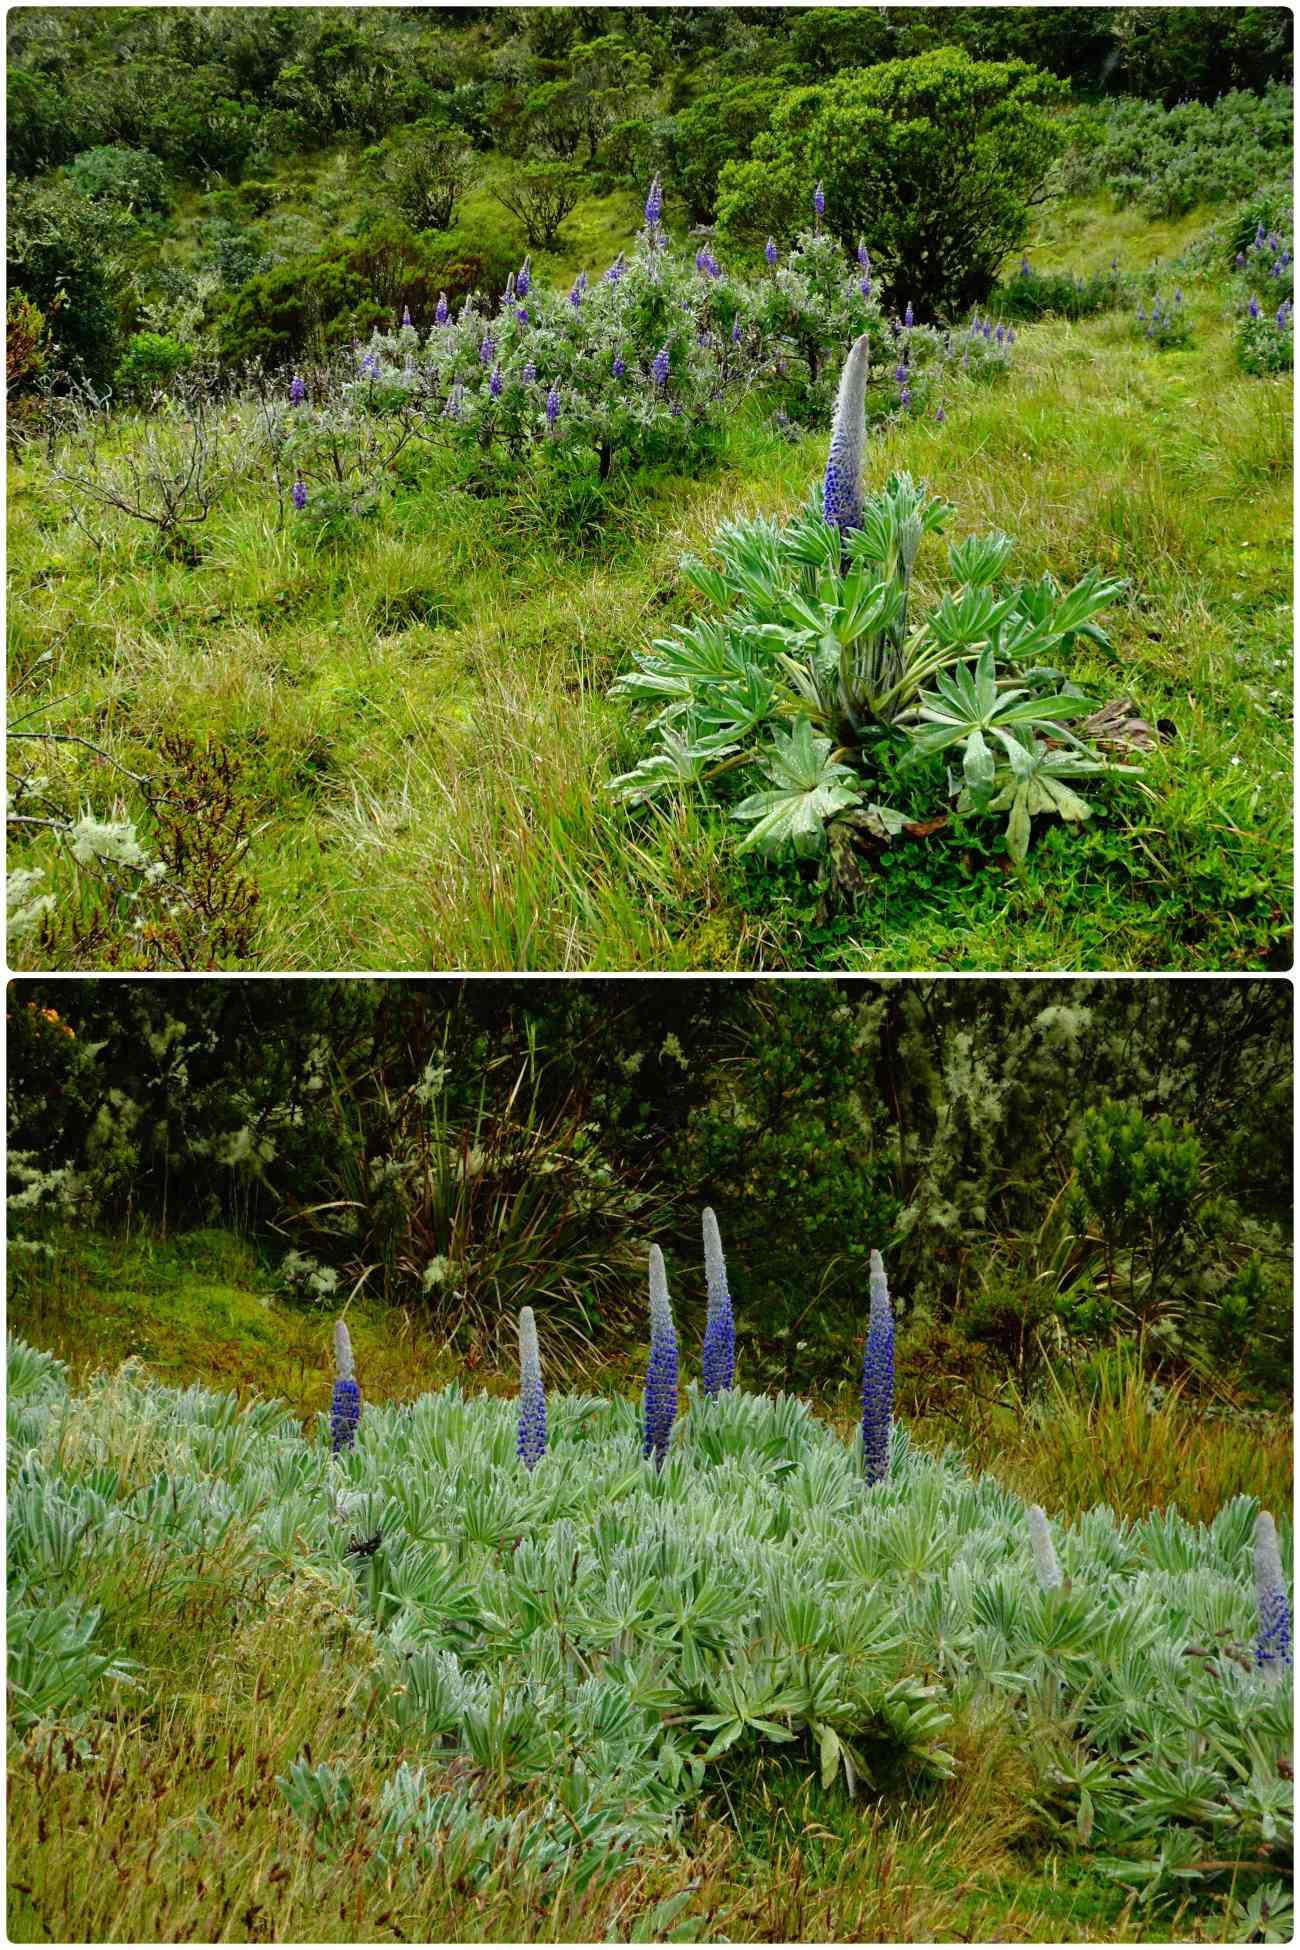 Oceta fleurs violettes